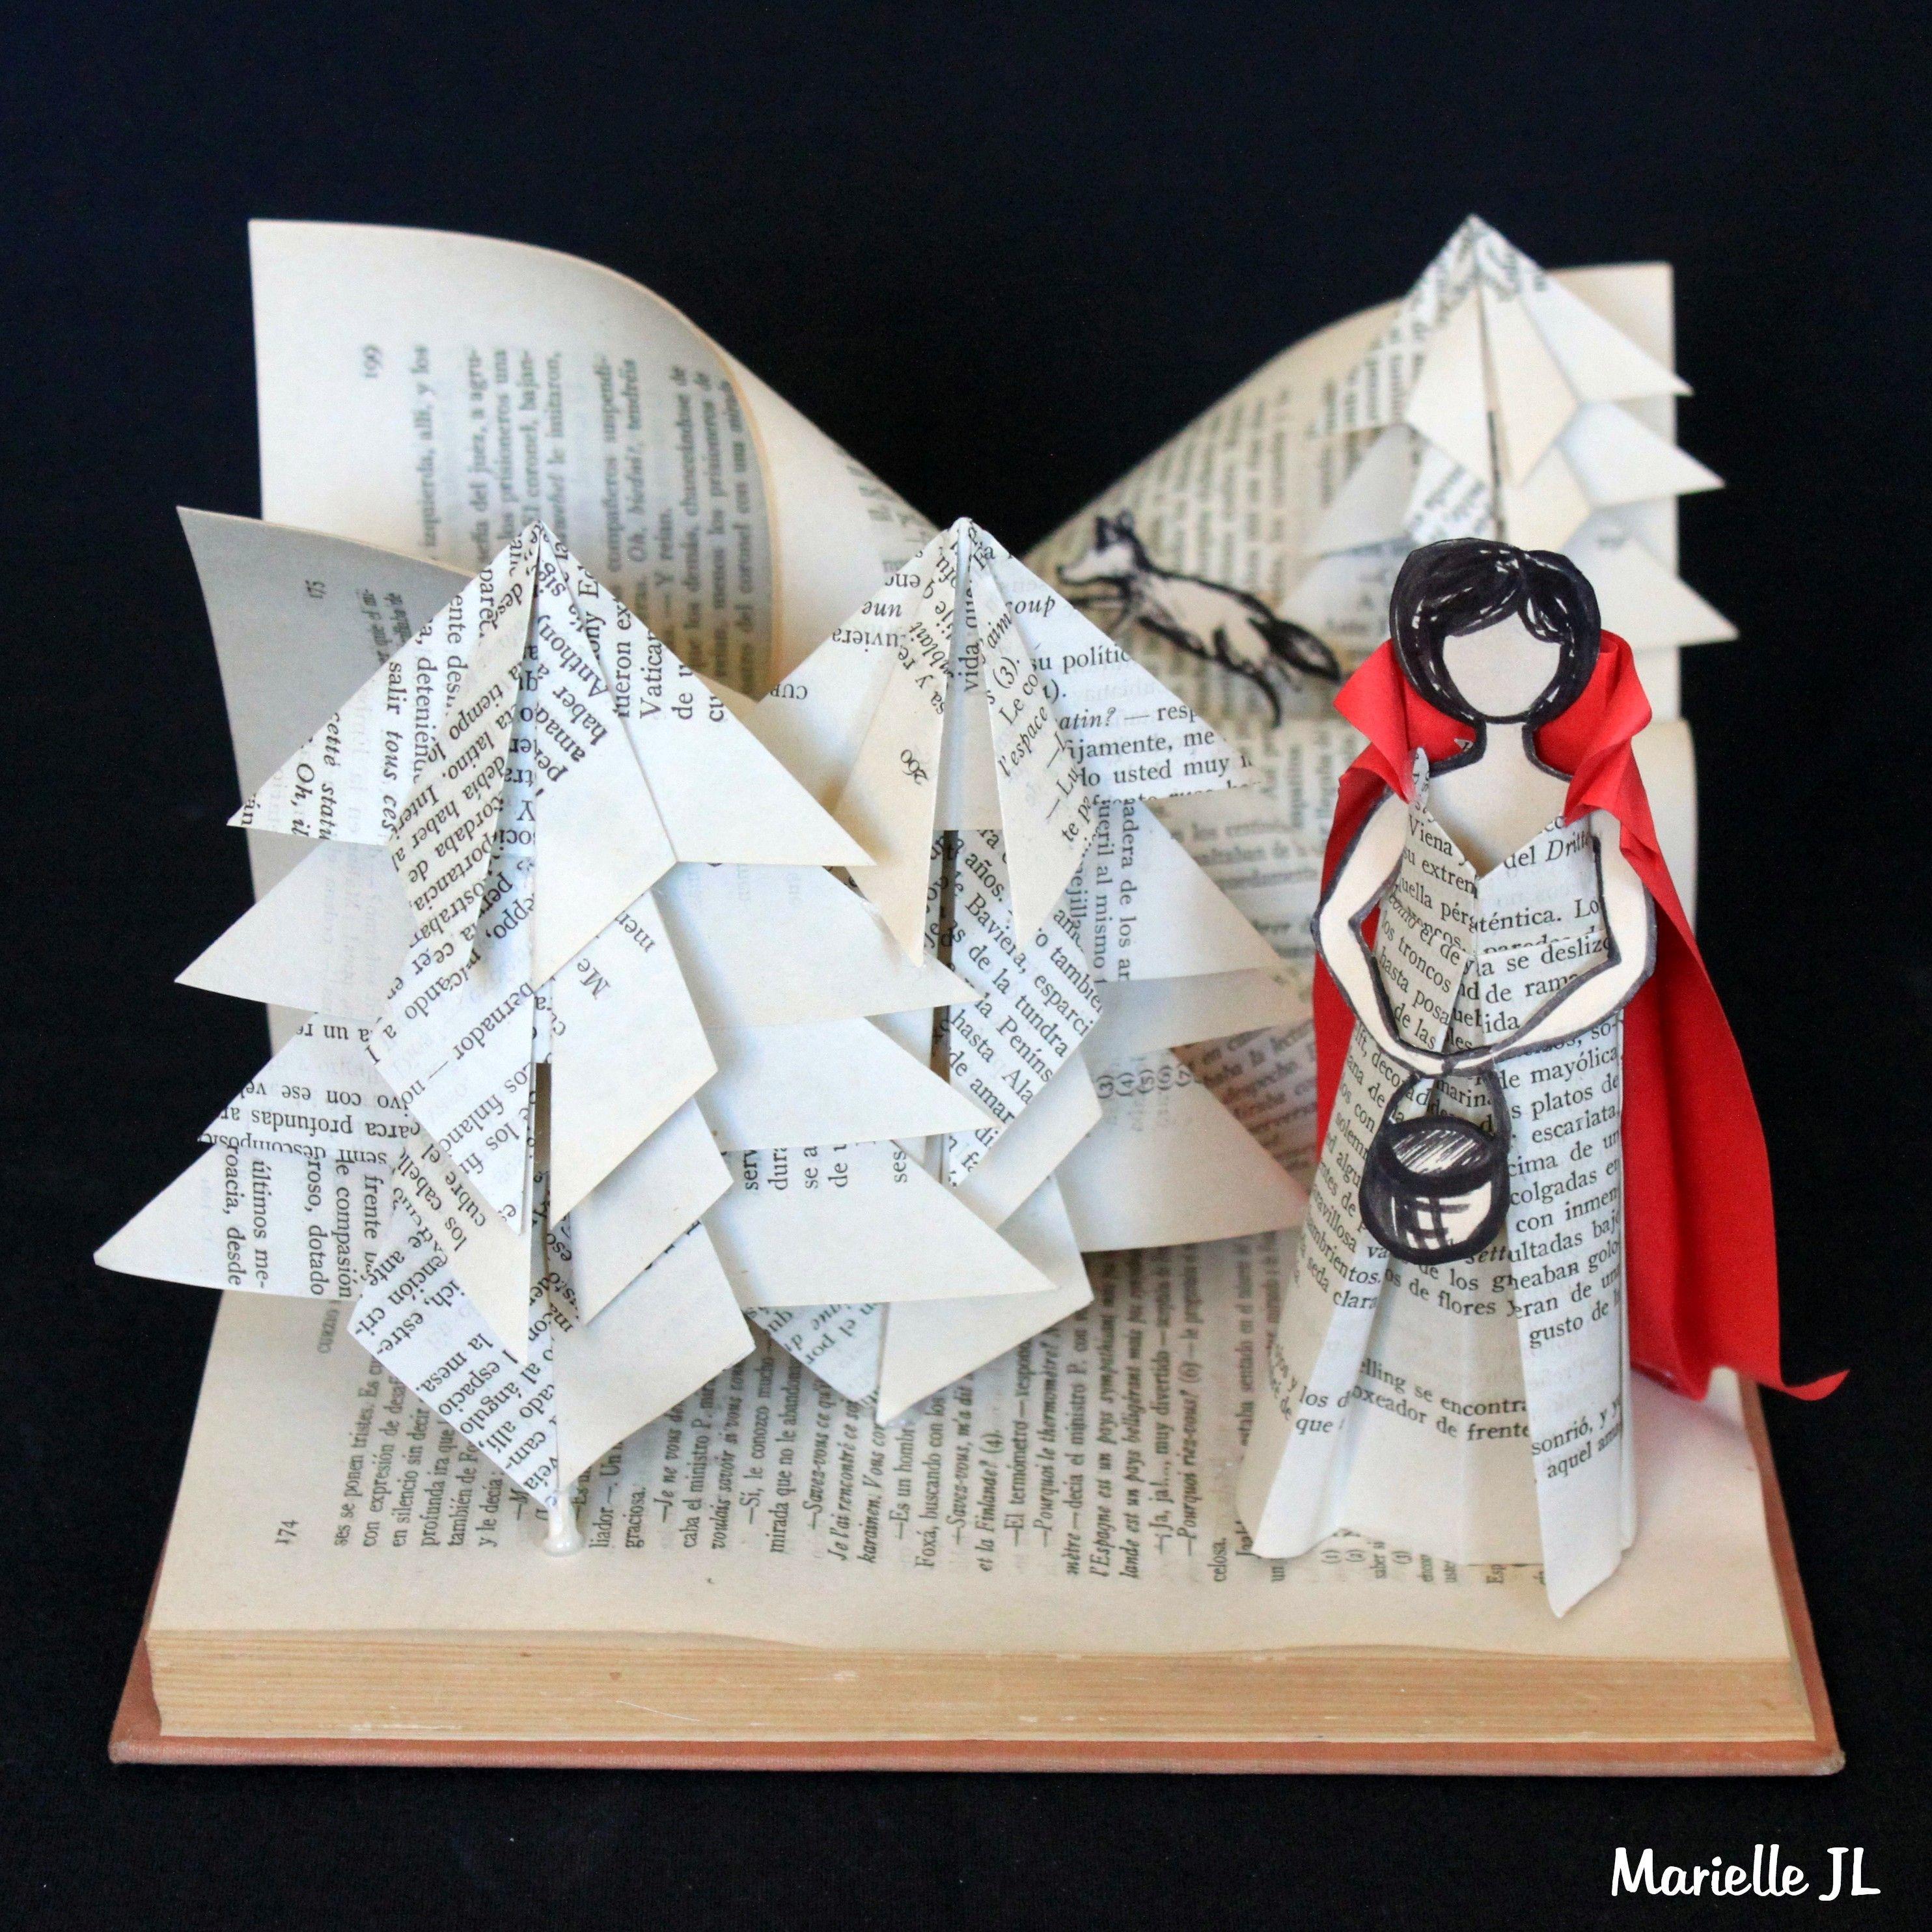 Book Art :Little Red Riding Hood - Livre d'artiste : Le Petit chaperon Rouge - Libro de artista : Caperucita Roja . Marielle JL